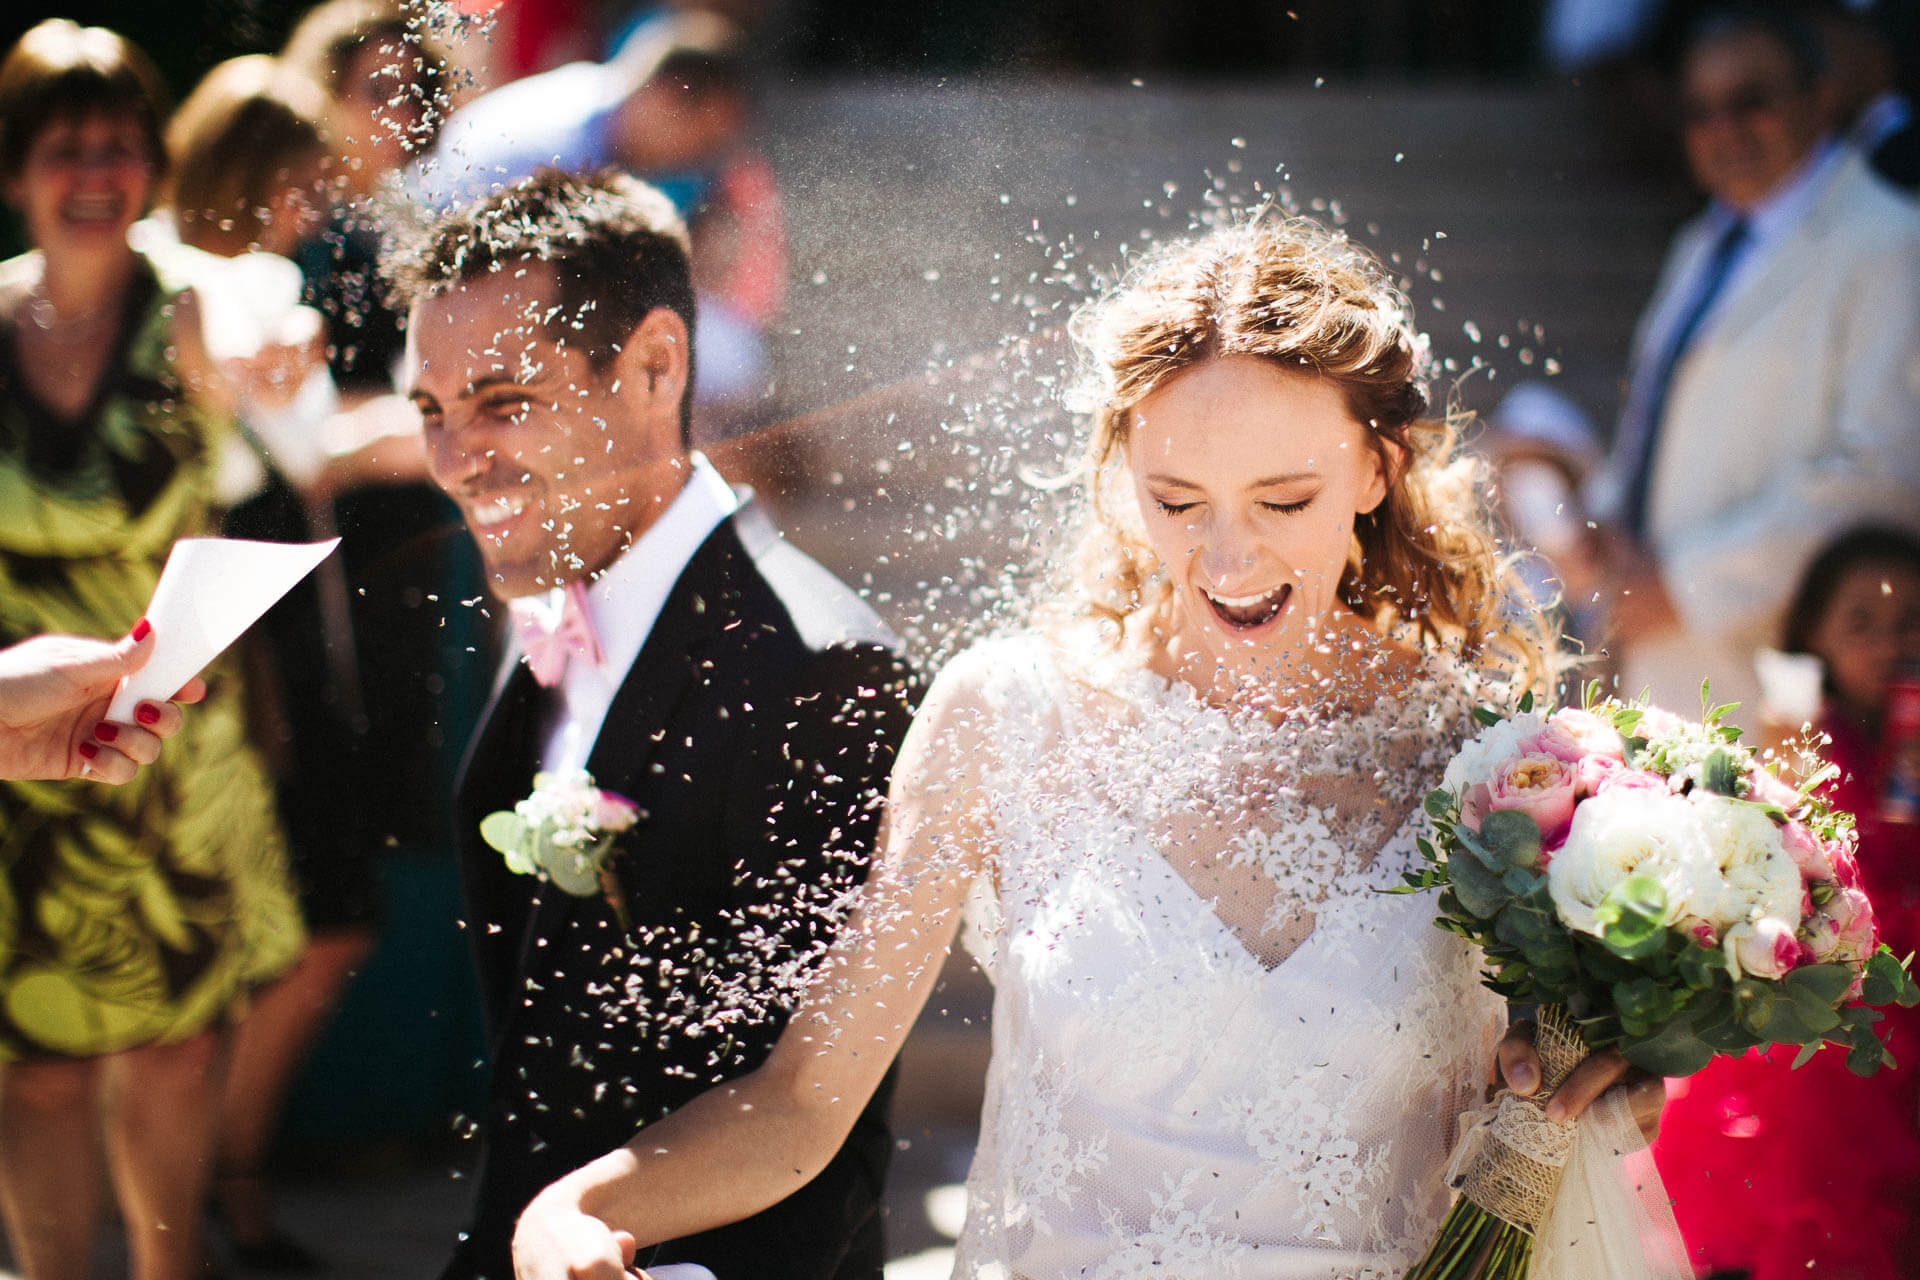 photographe-mariage-aix-en-provence-stephanie-jerome-7